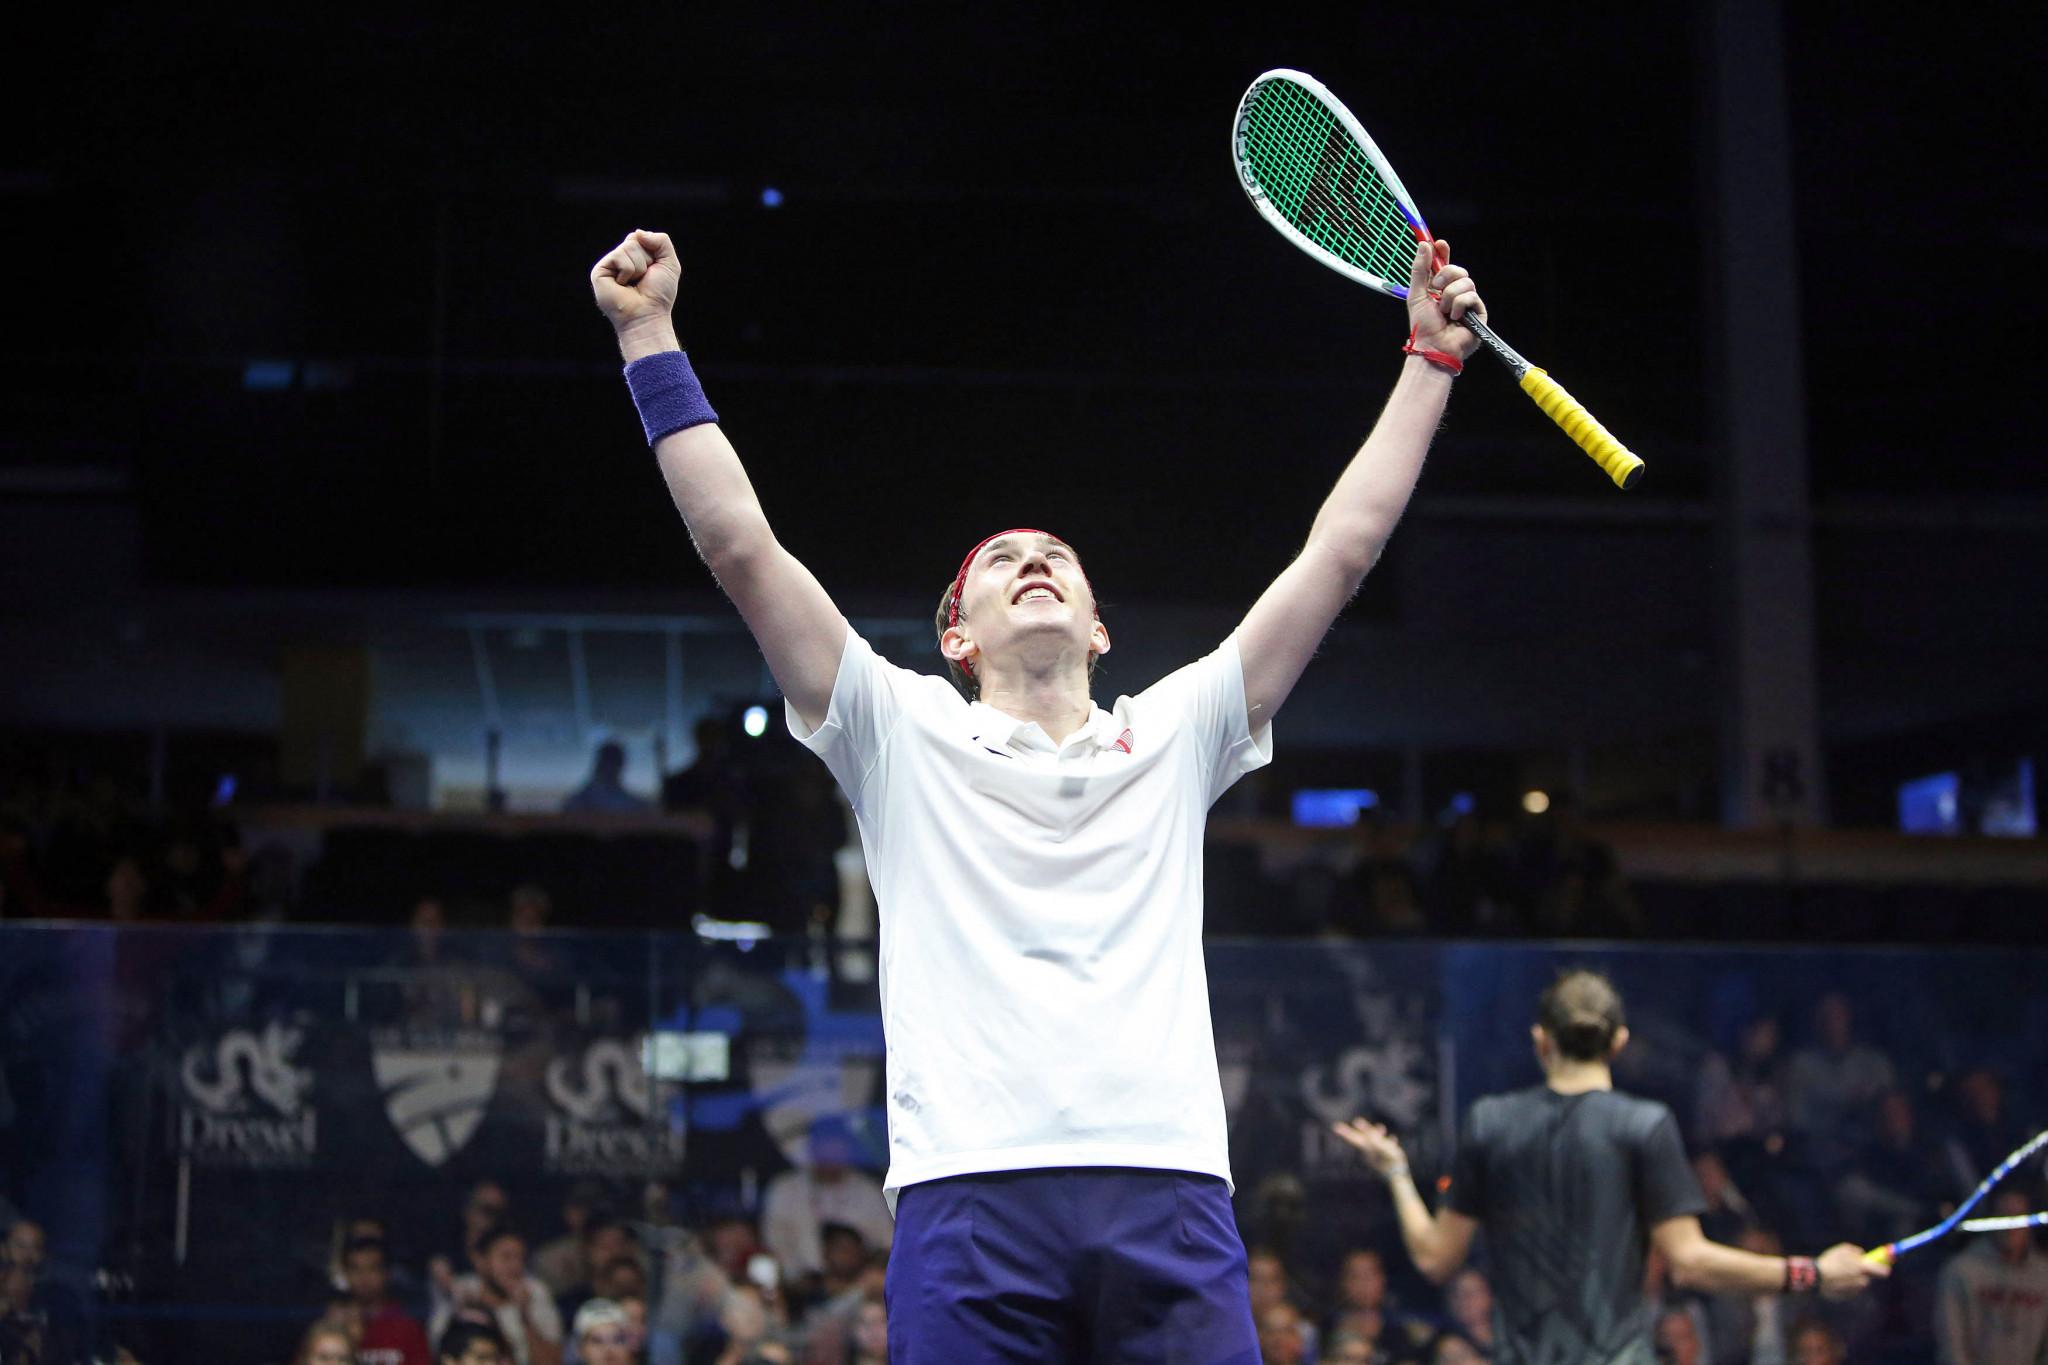 Home favourite Douglas stuns Serme at PSA U.S. Open